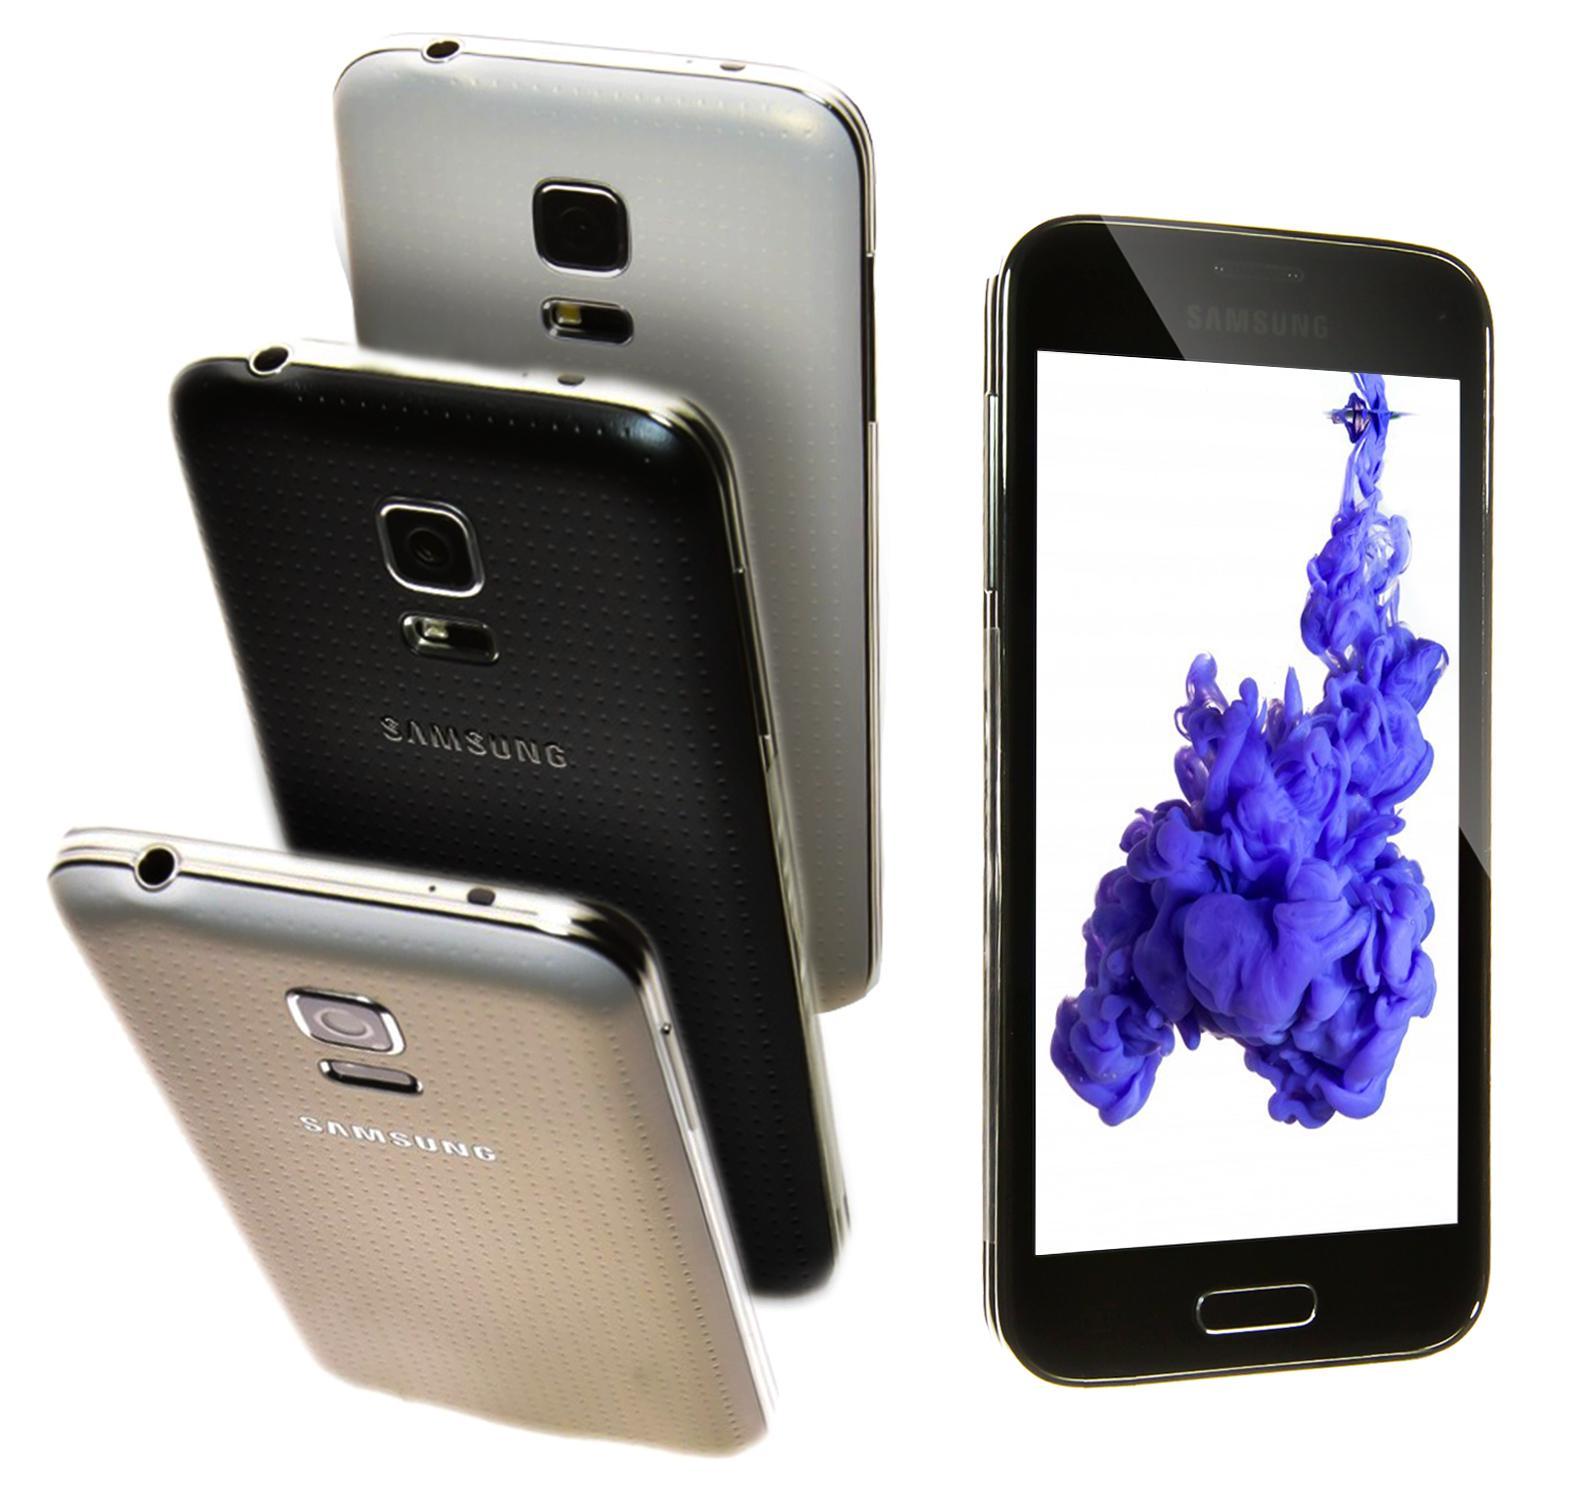 samsung galaxy s5 mini 16 gb wei gebraucht. Black Bedroom Furniture Sets. Home Design Ideas